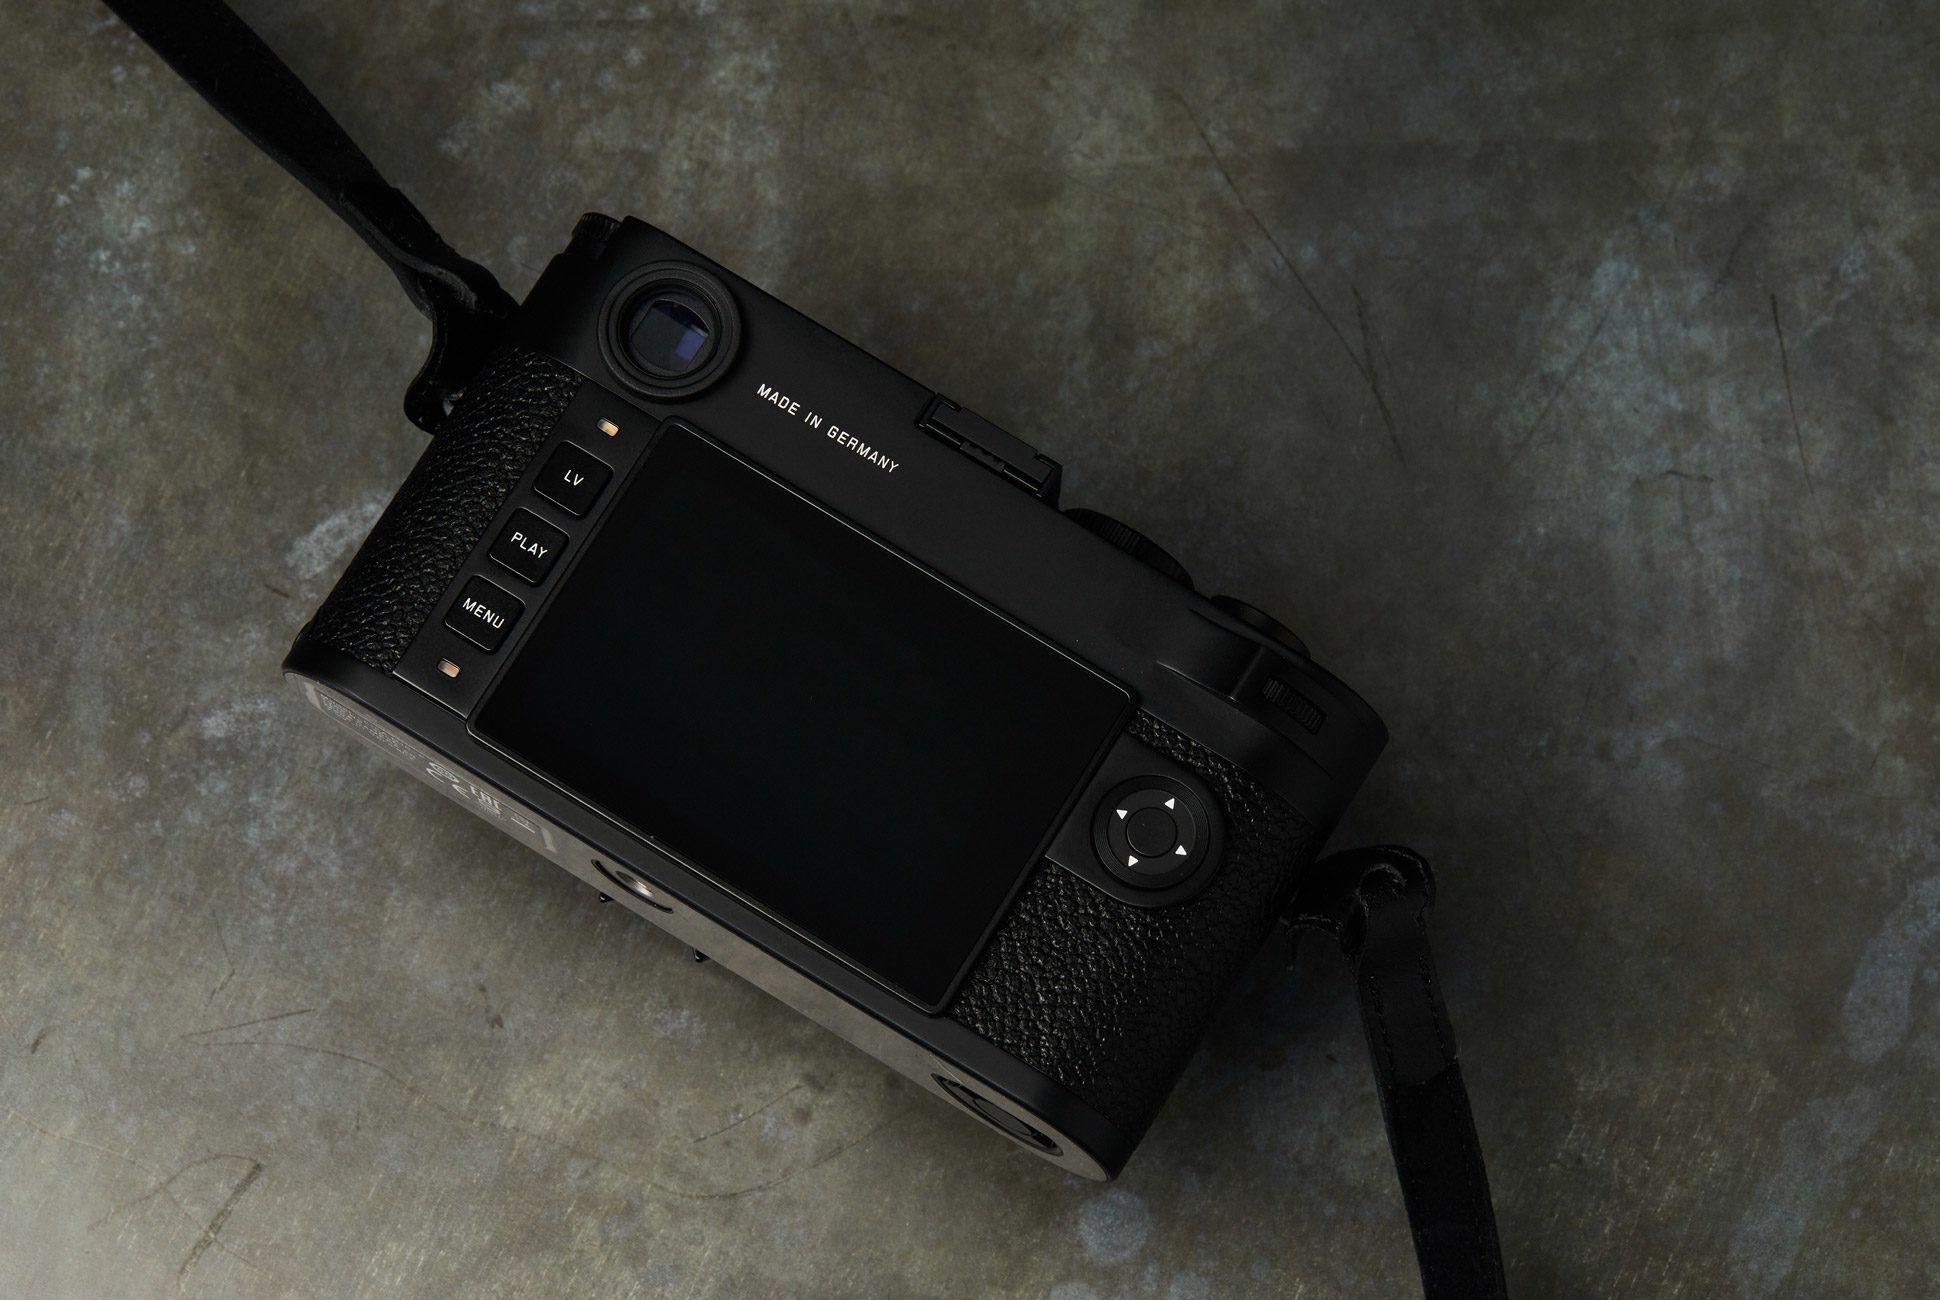 Leica-M10P-Gear-Patrol-Slide-3